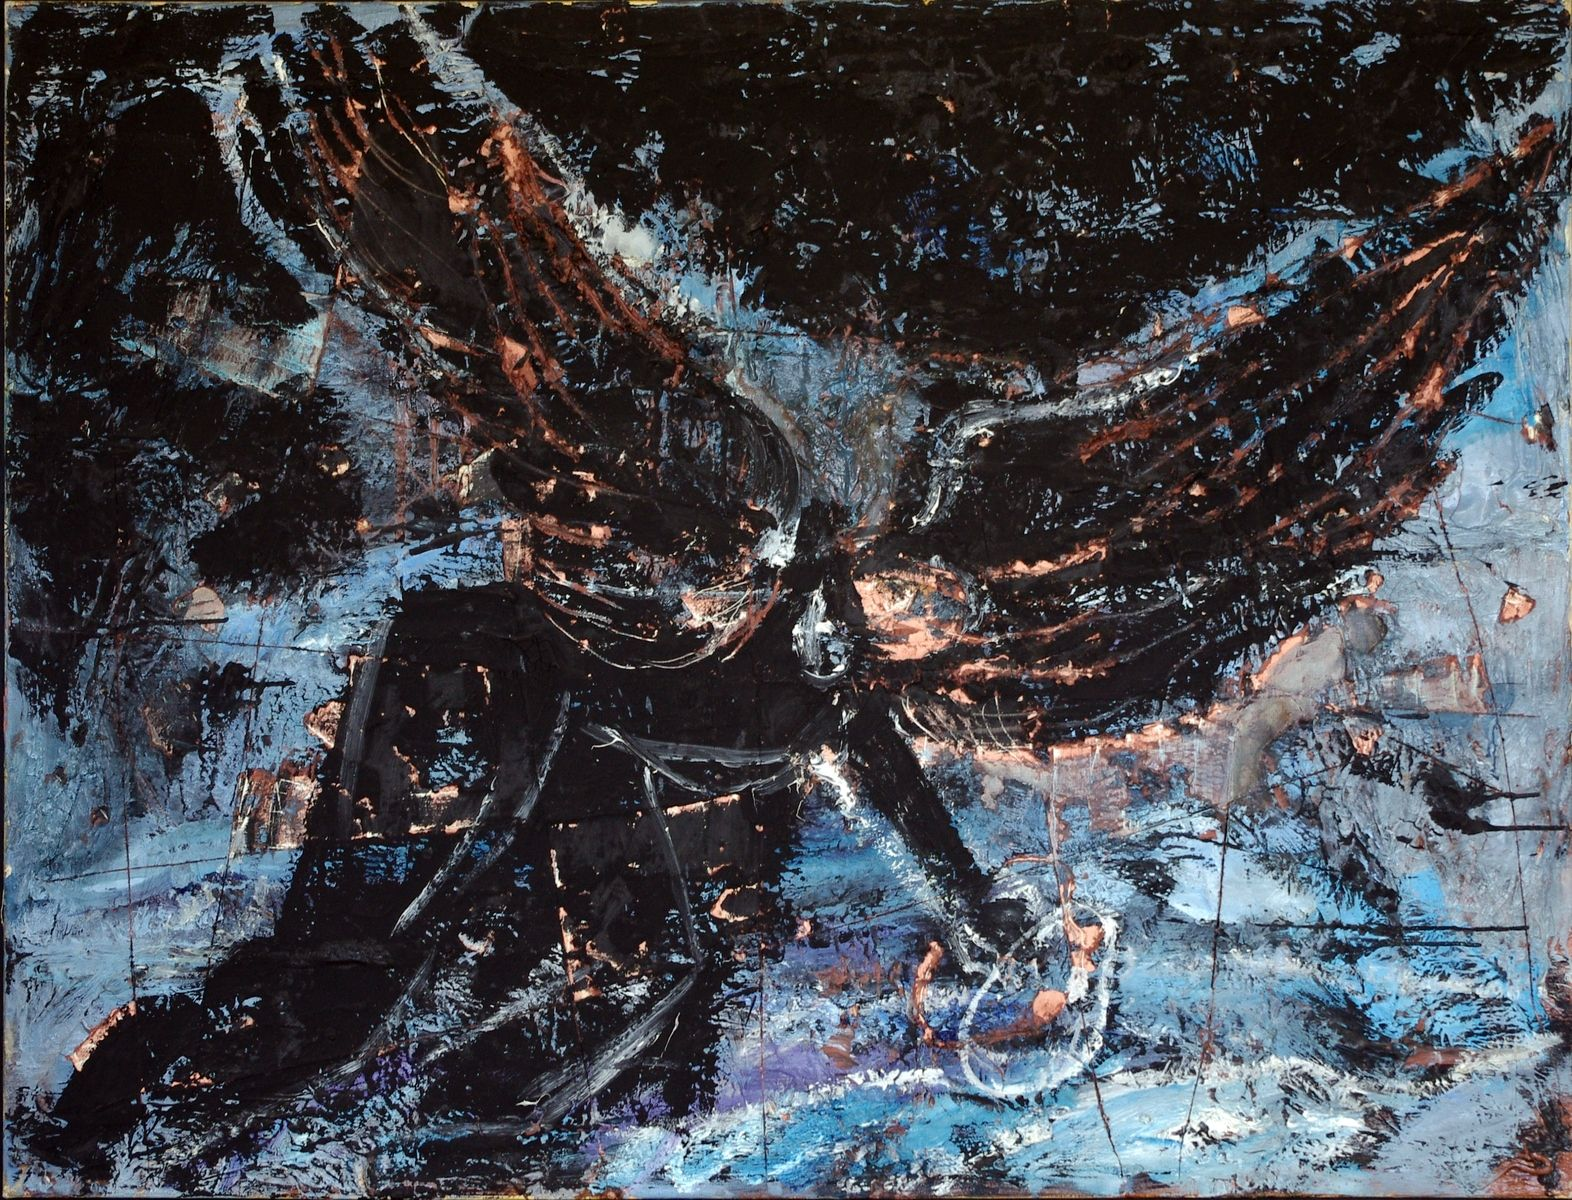 #ART Anselm Kiefer